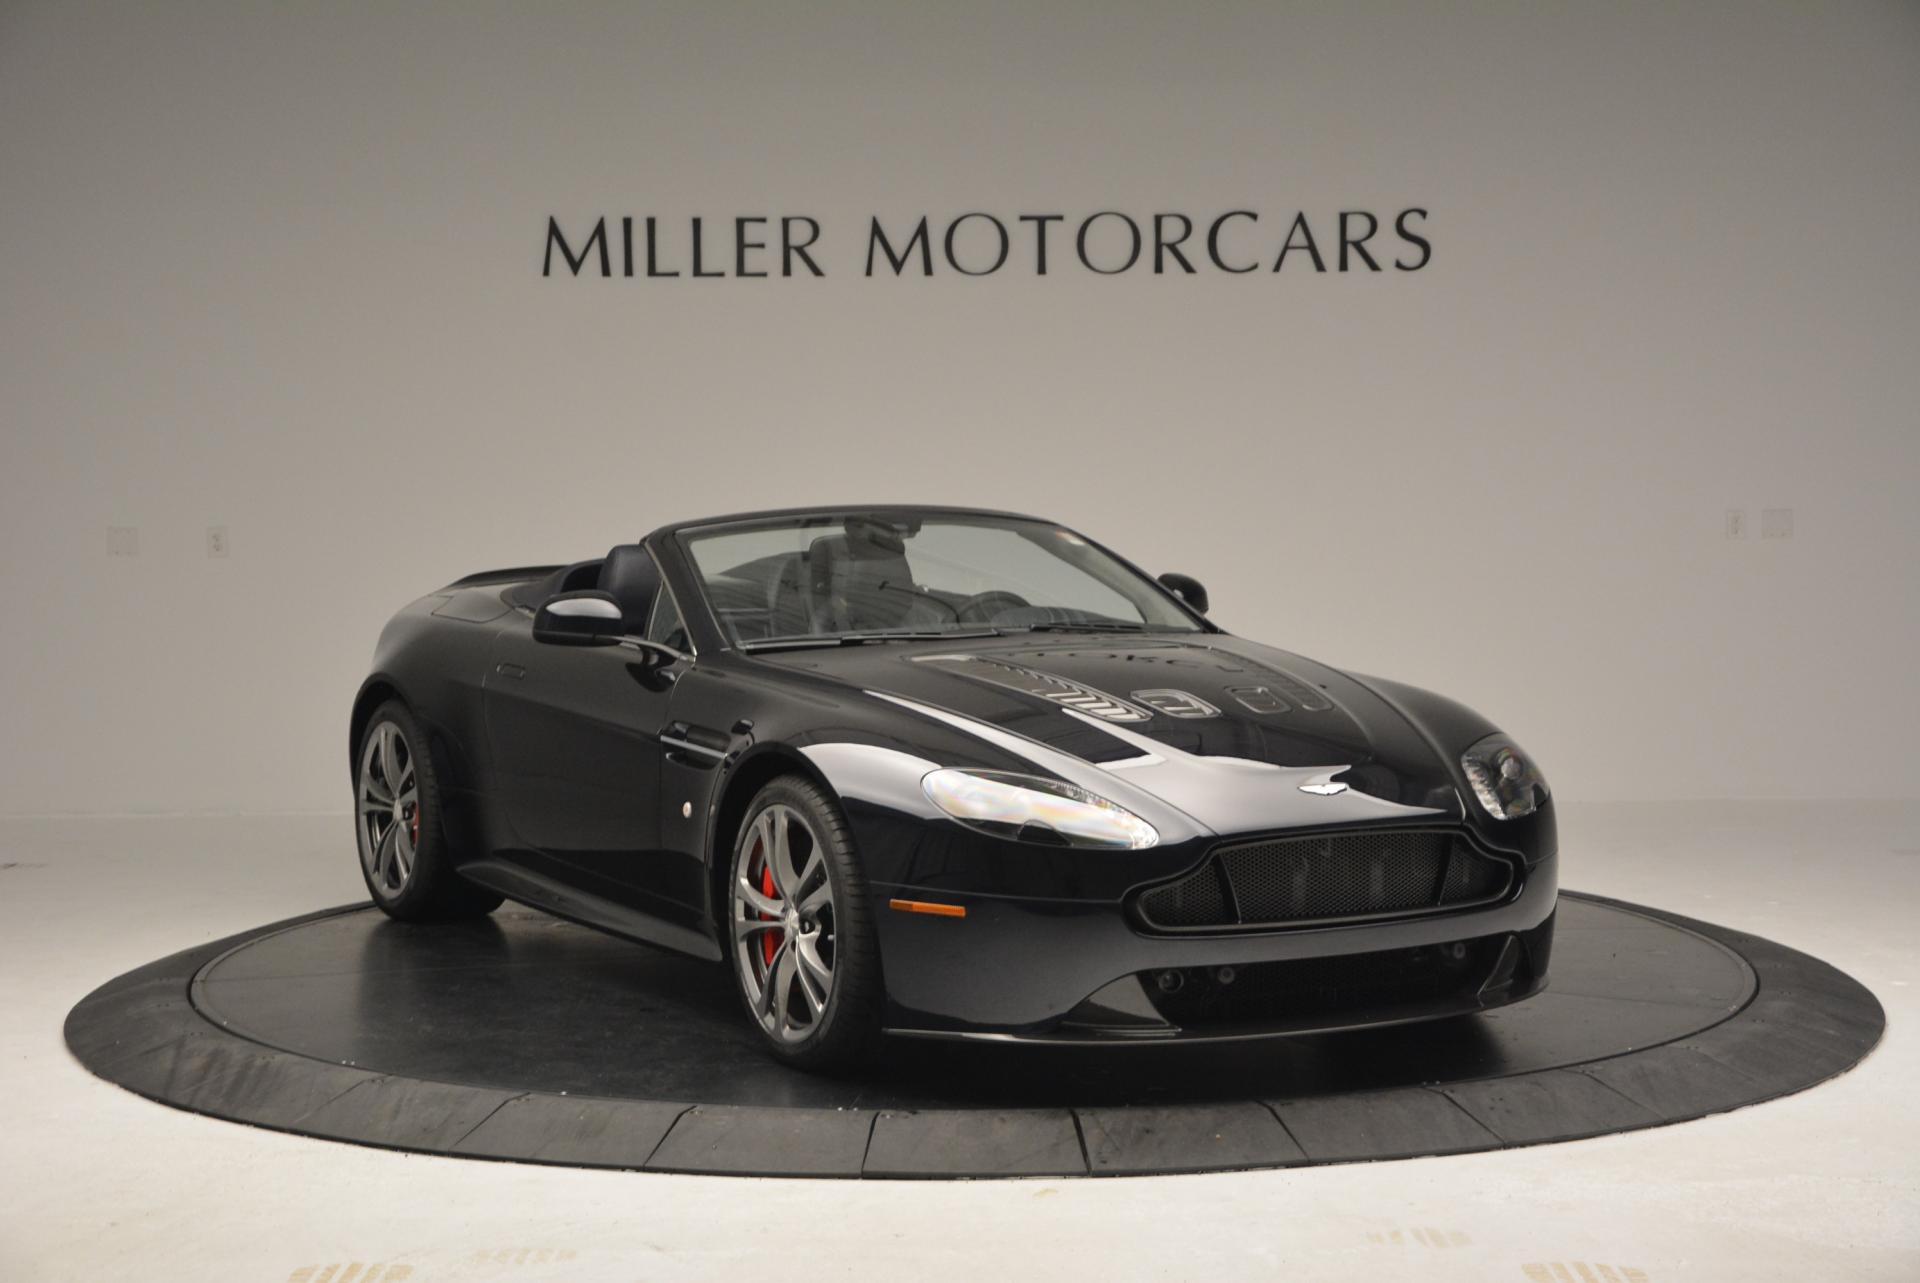 Used 2016 Aston Martin V12 Vantage S Convertible For Sale In Greenwich, CT. Alfa Romeo of Greenwich, 7579 89_p11